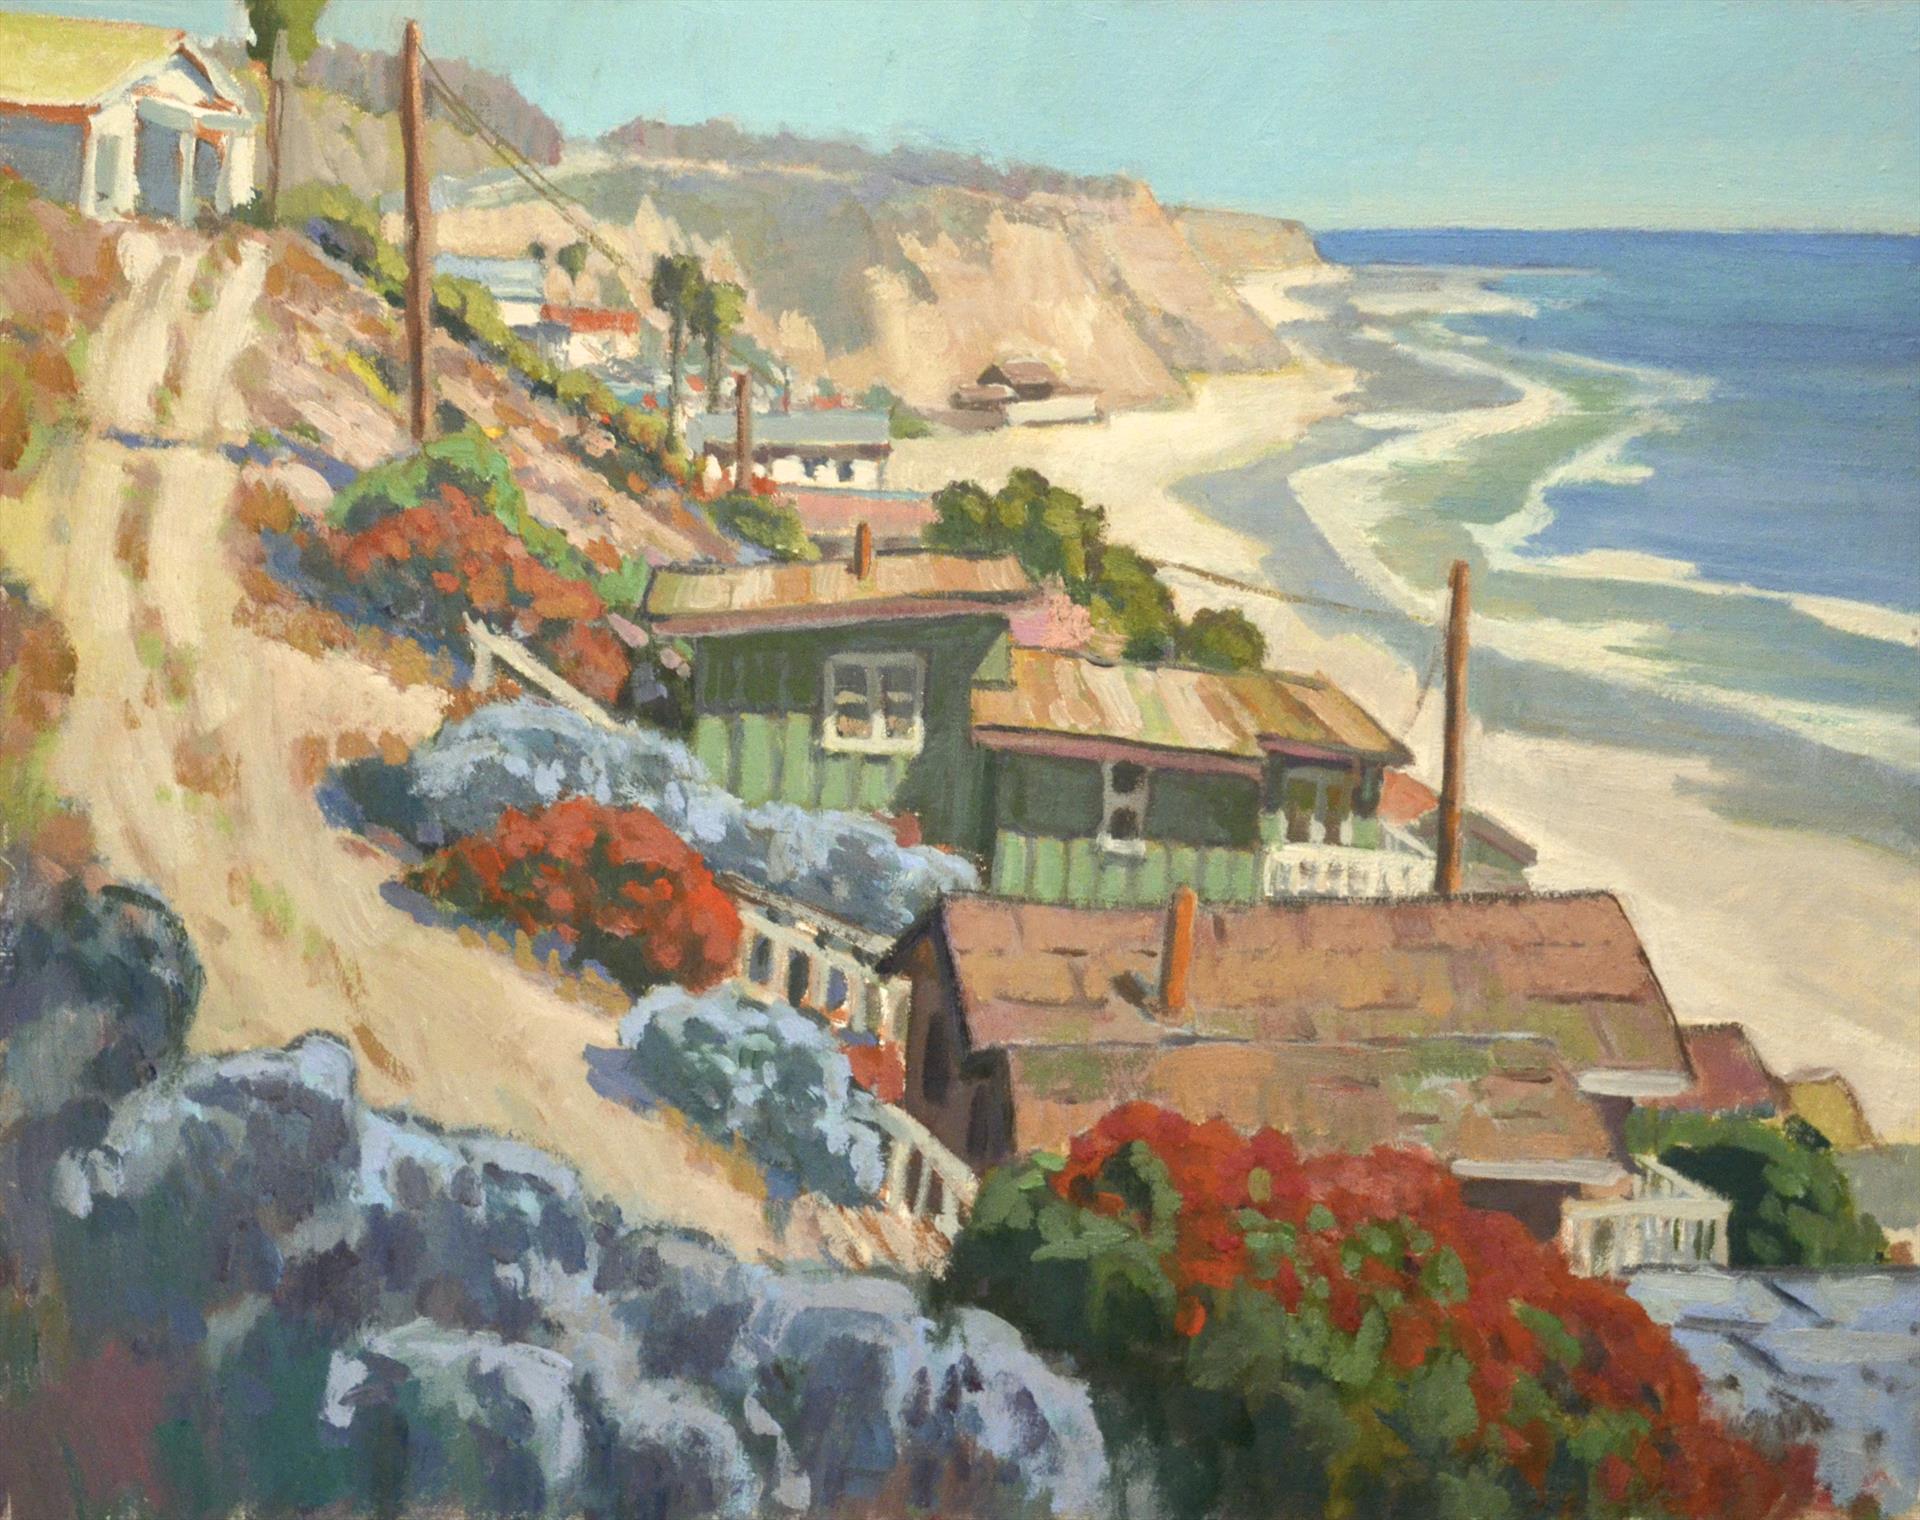 Crystal Cove Heritage by Mark Fehlman